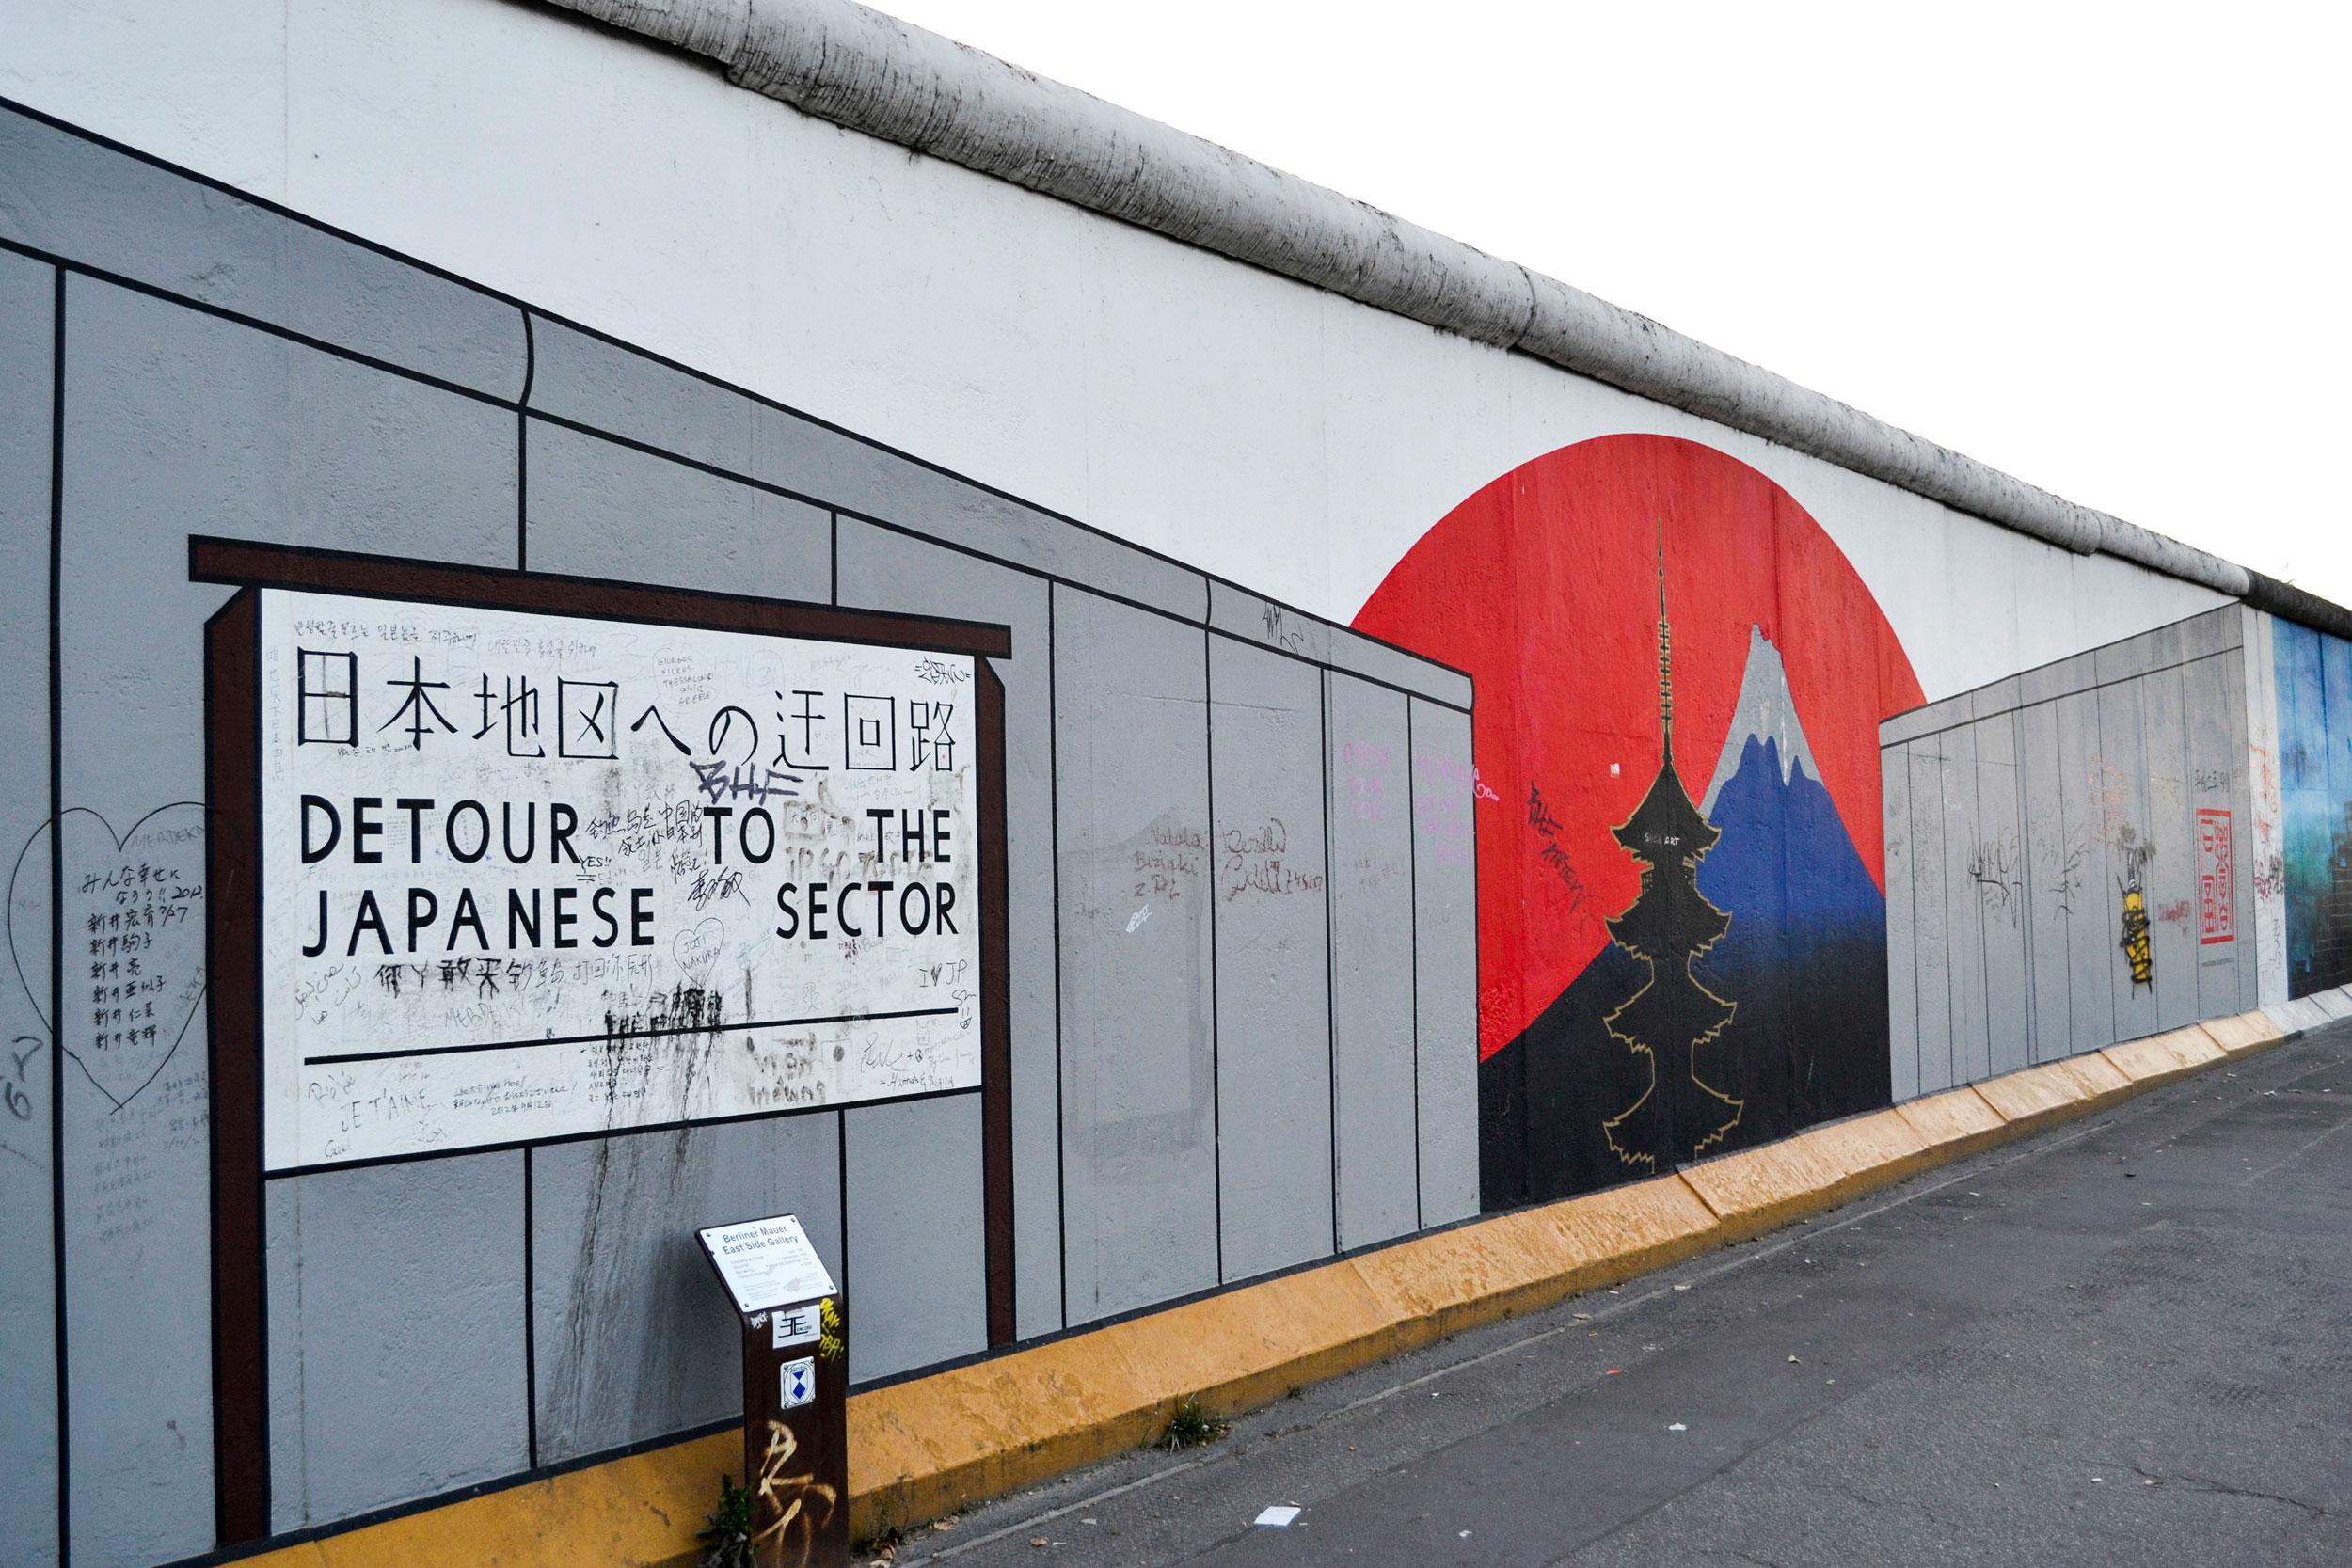 berlin-wall-04.jpg